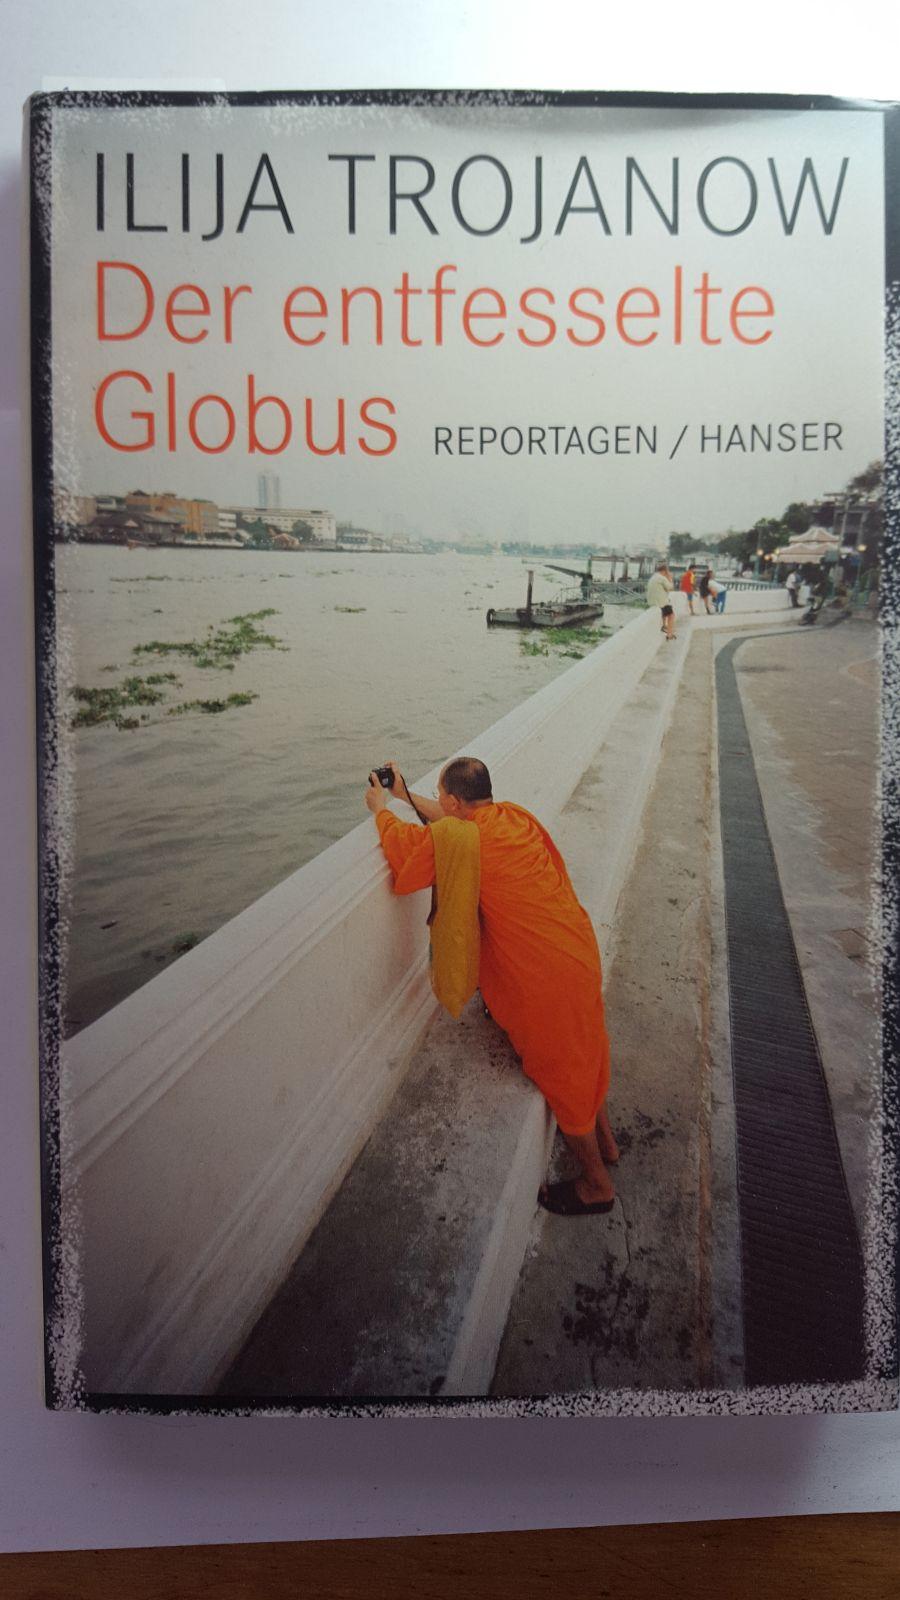 Der entfesselte Globus: Reportagen.: Trojanow, Ilija: